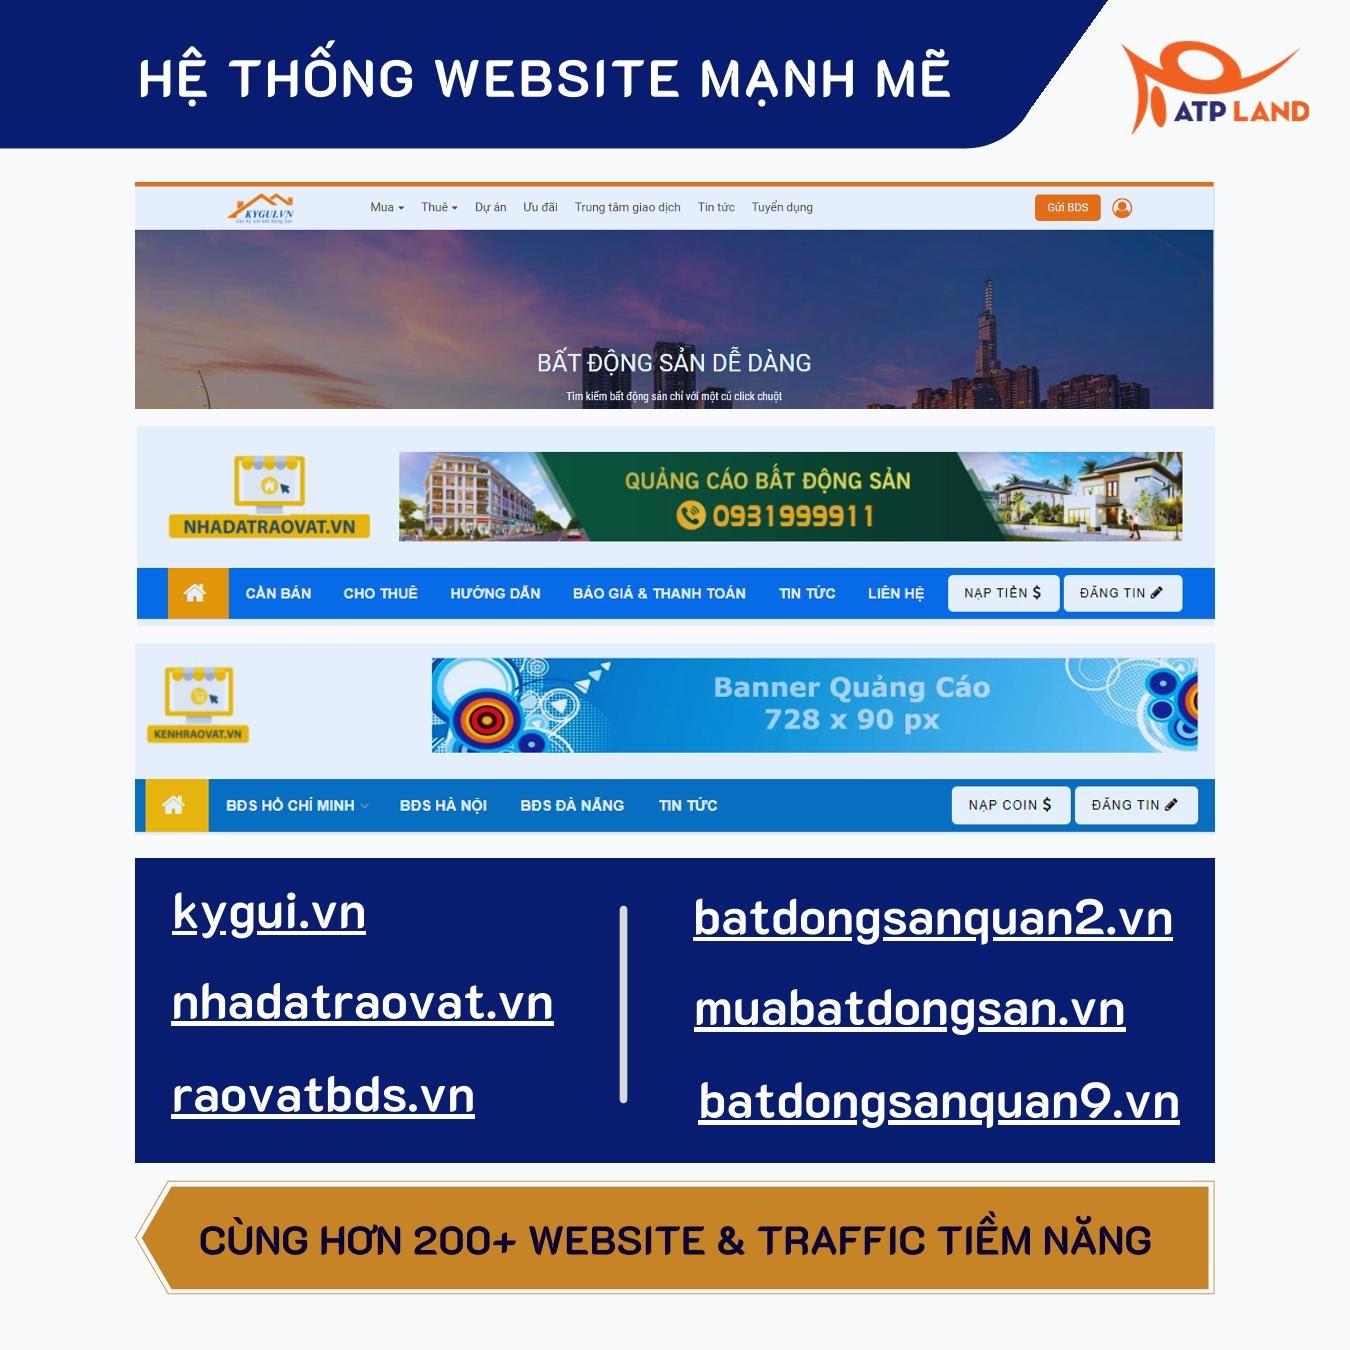 nền tảng website atpland